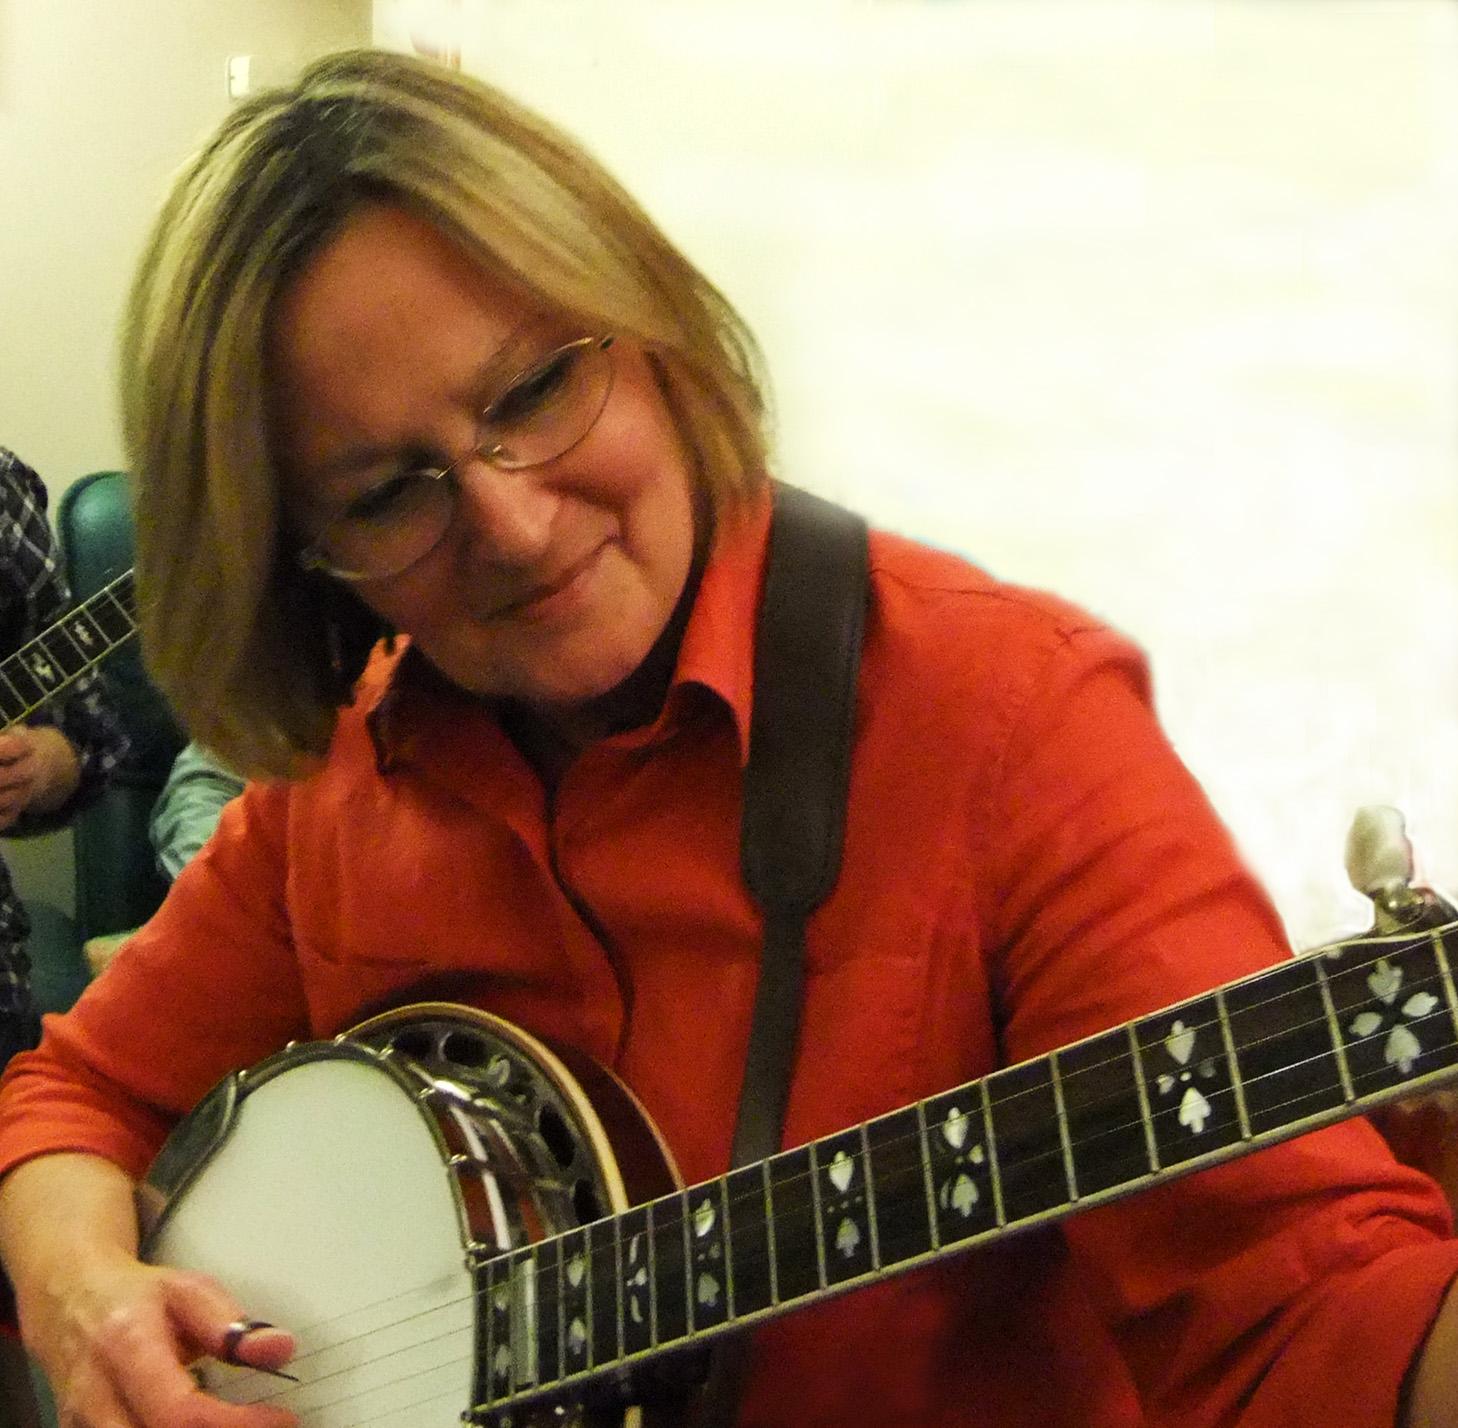 Liz Mc @ Keith's jam - 2010 Nov 20.jpg